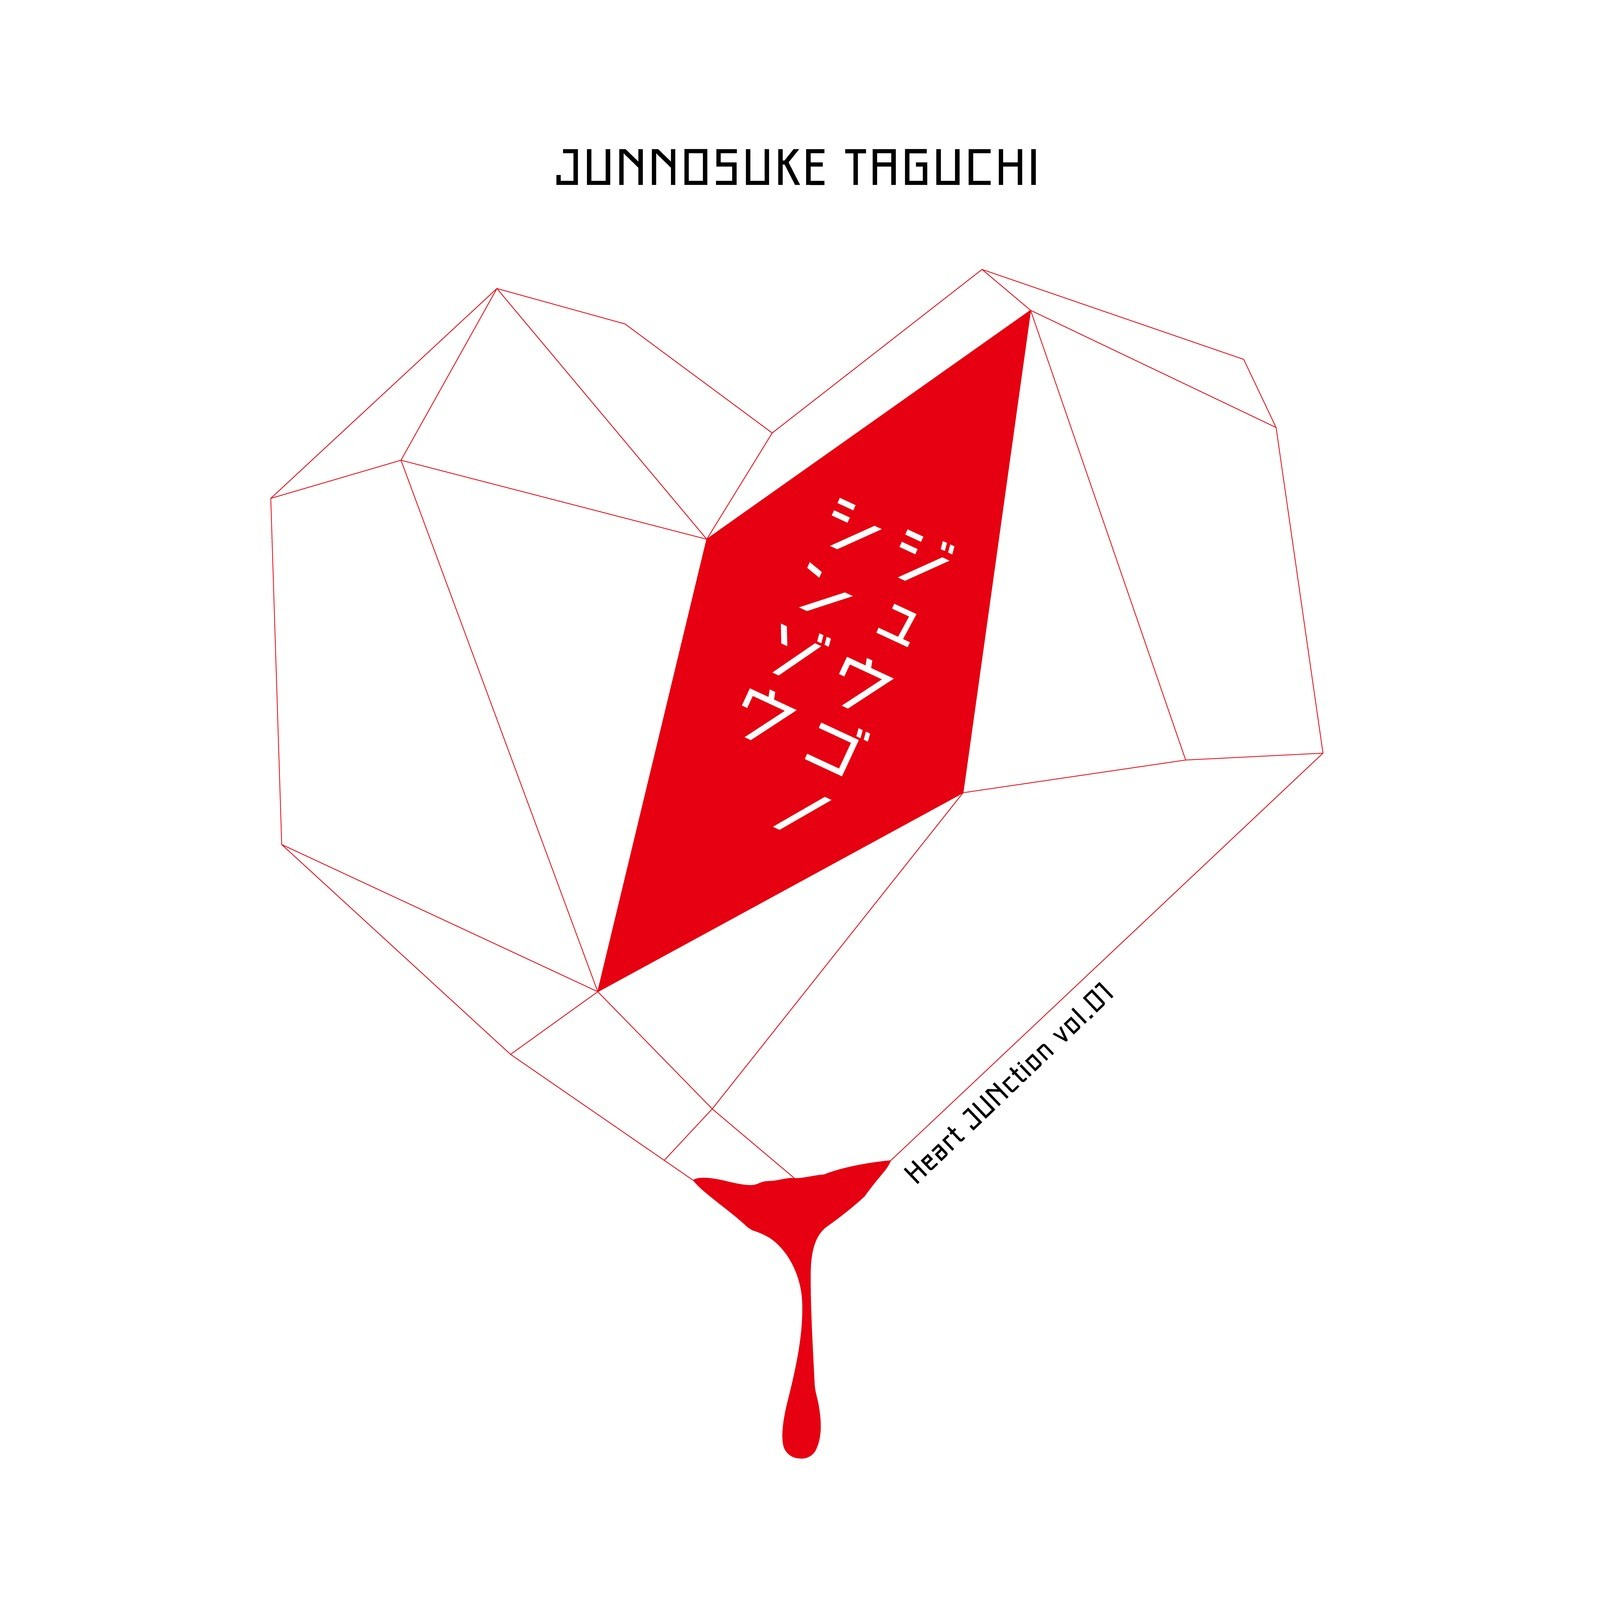 [Album] 田口淳之介 (Junnosuke Taguchi) – ジュウゴノシンゾウ [FLAC / 24bit Lossless / WEB] [2020.06.10]